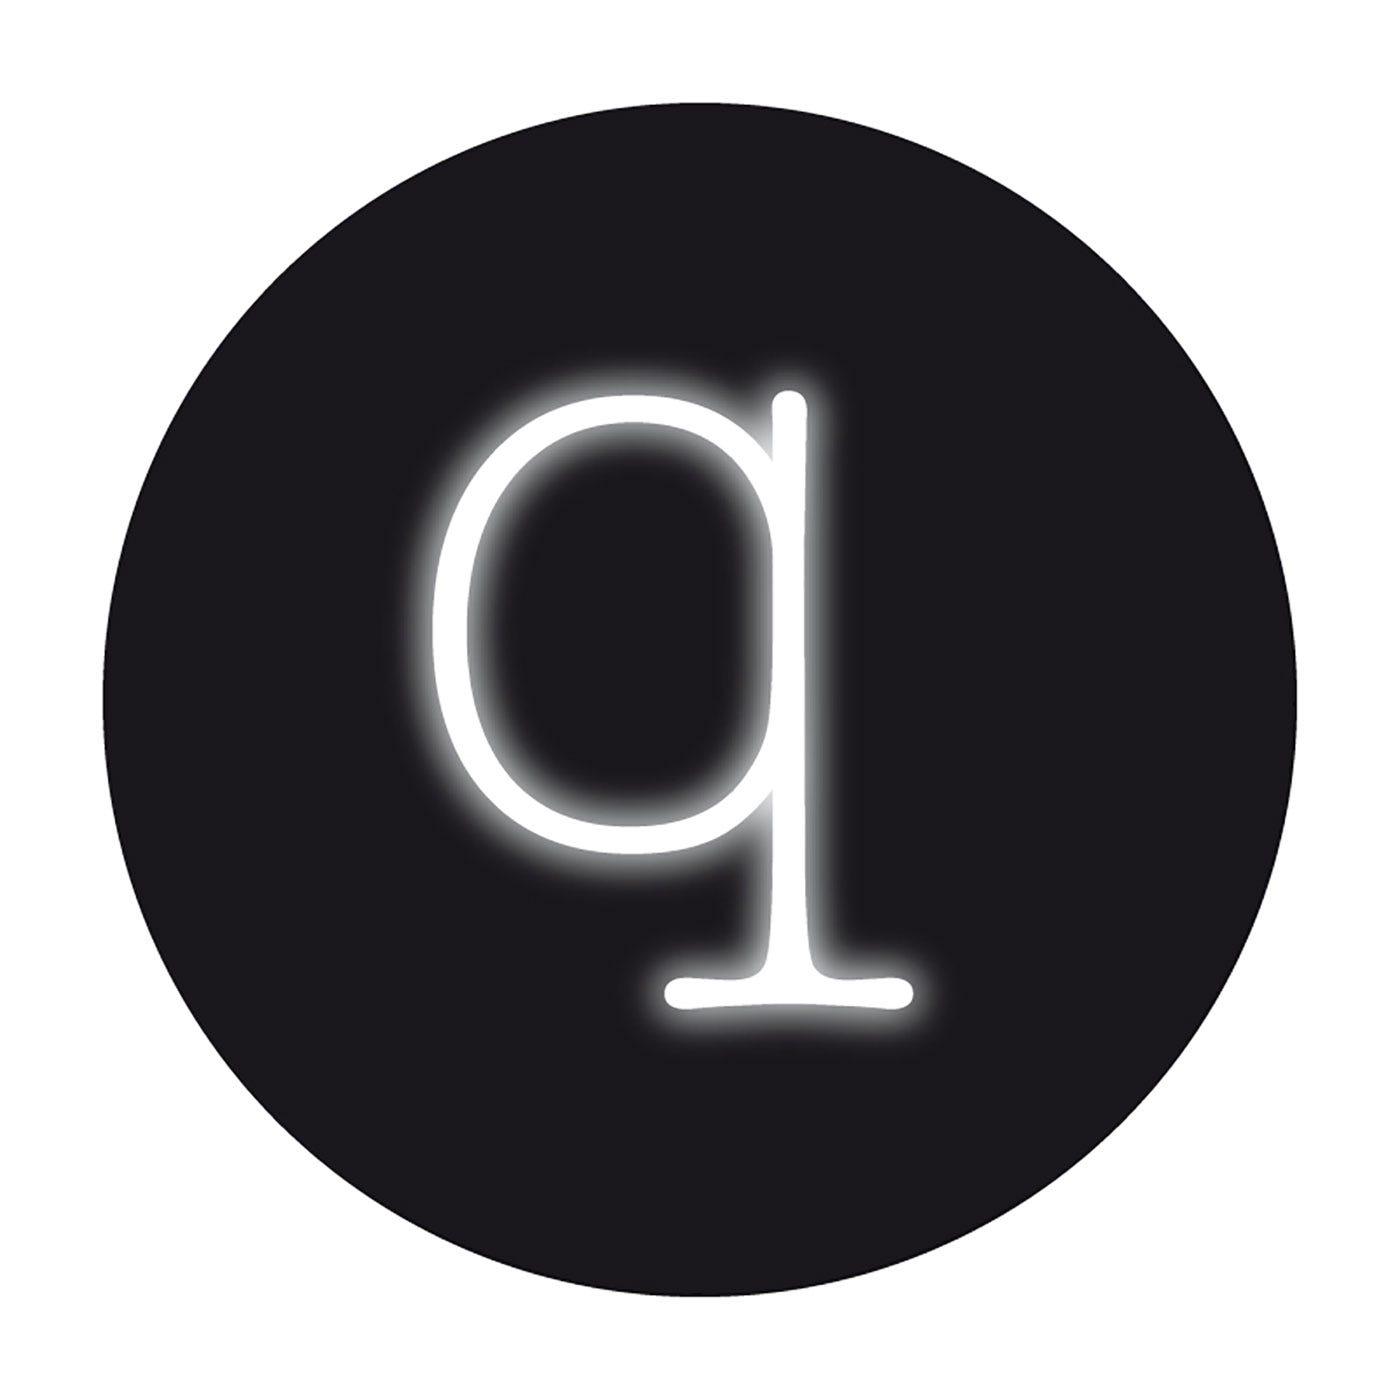 Neon Font Wall Light Q